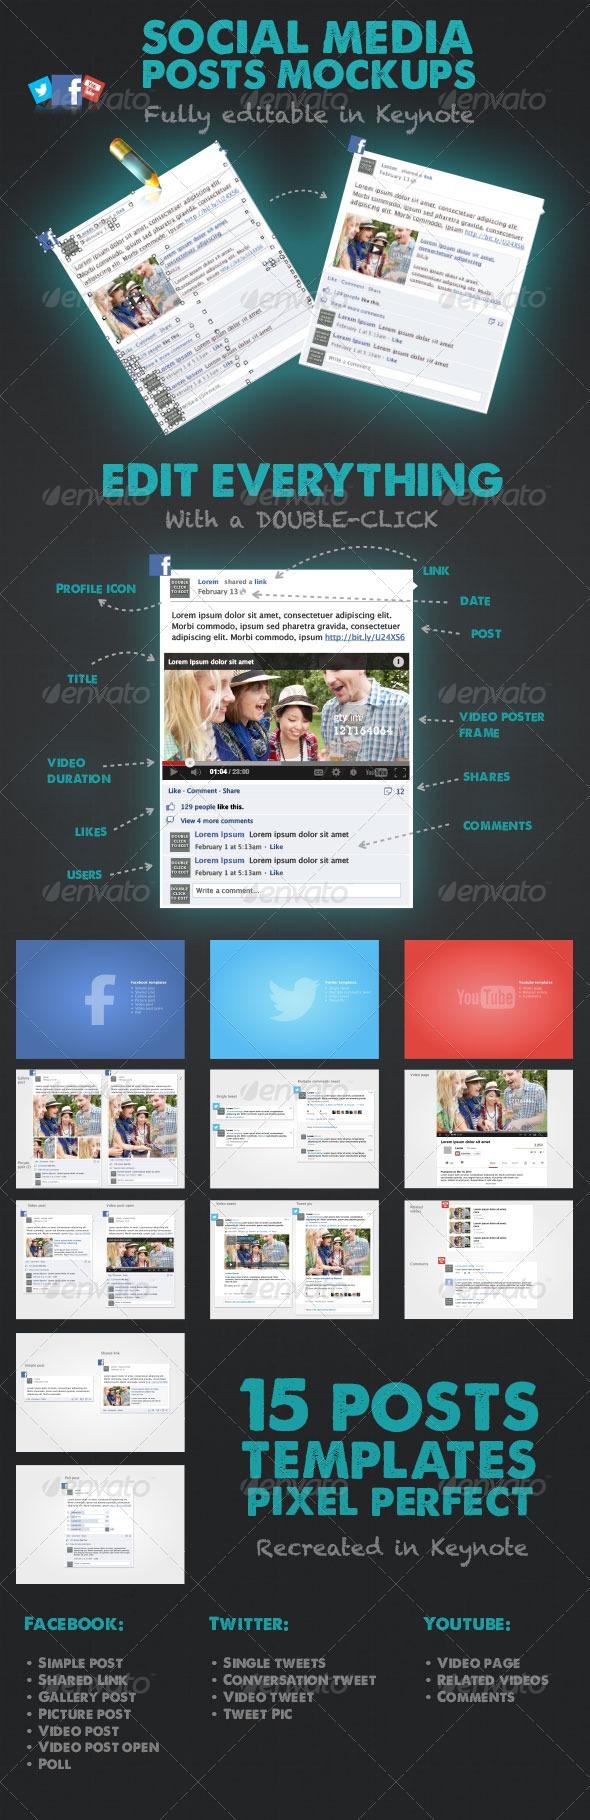 GraphicRiver 15 Social Media Posts Editable Mockups 4577580